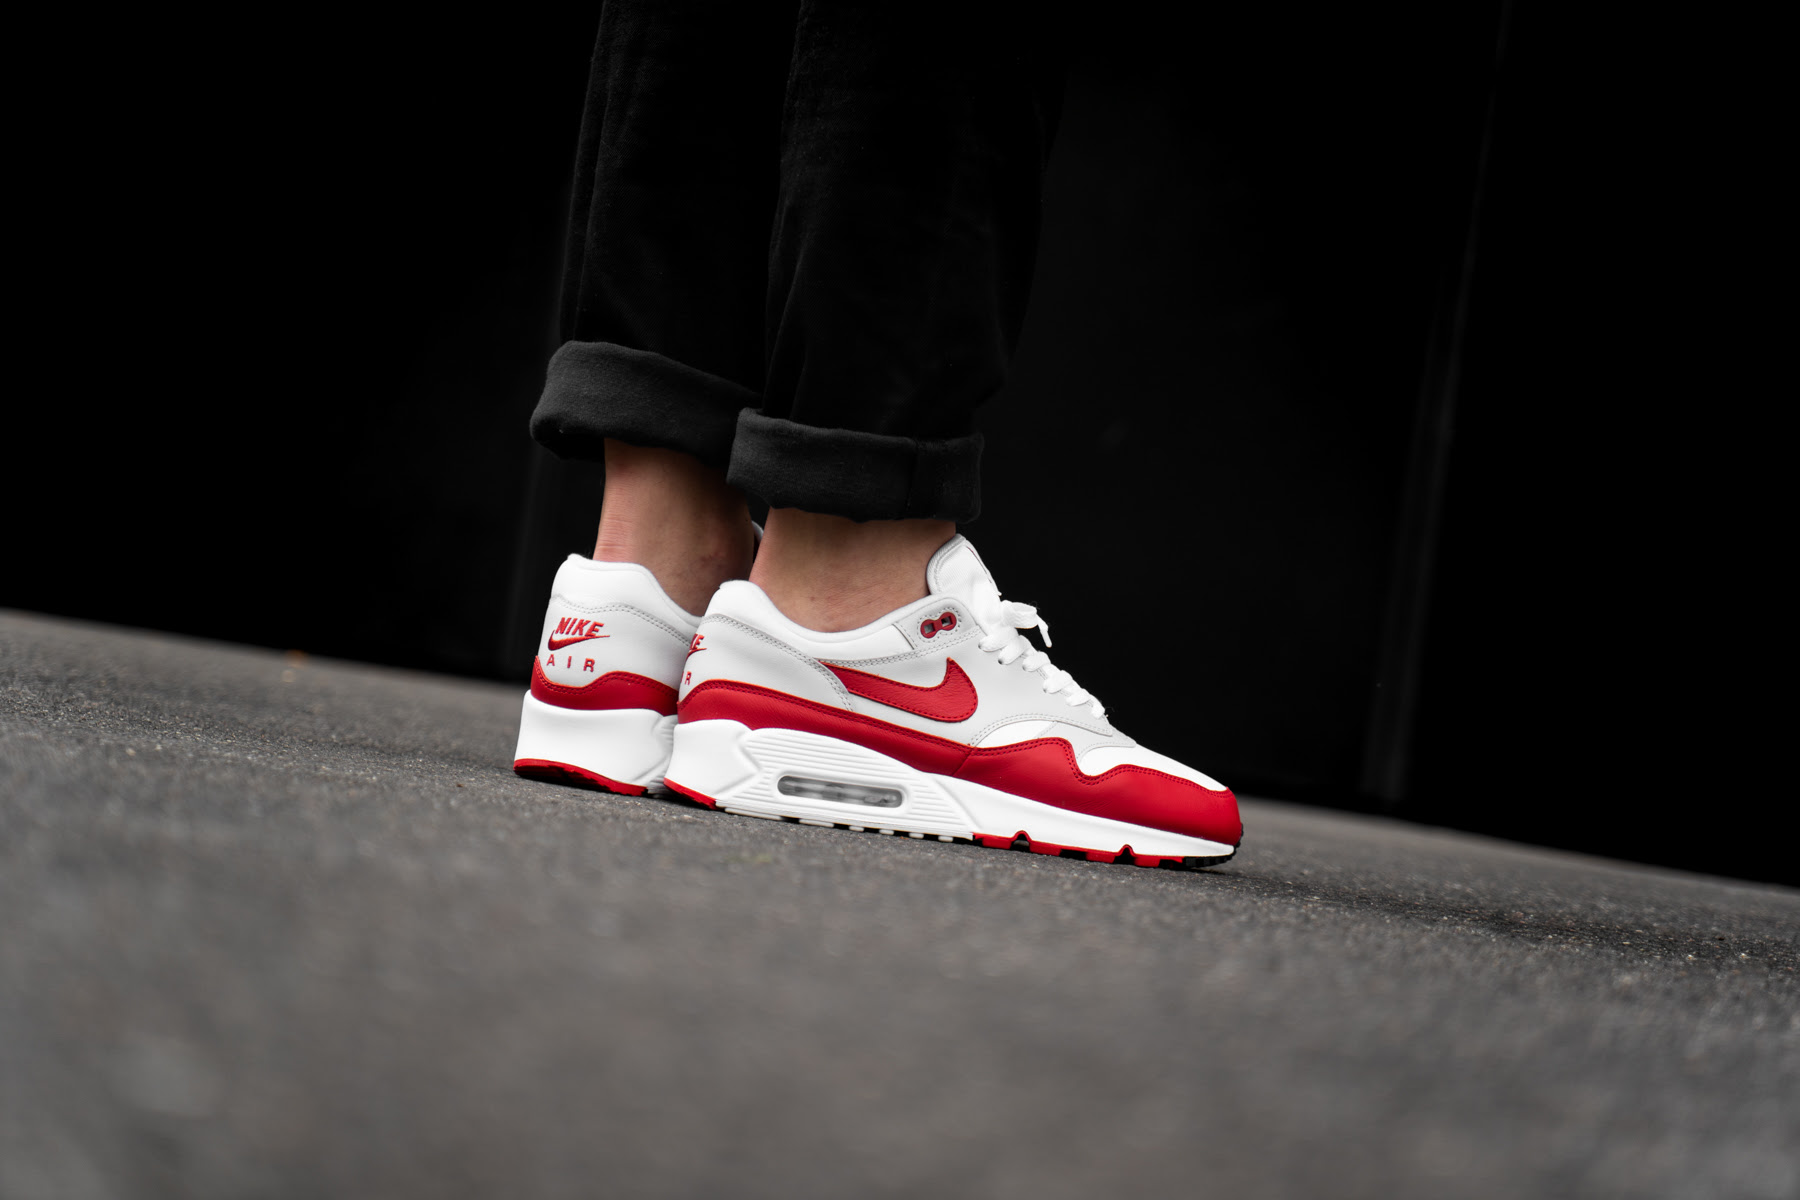 premium selection 43521 2eb03 ... sweden on foot nike air max 90 1 og eukicks sneaker magazine 80c48 1c499